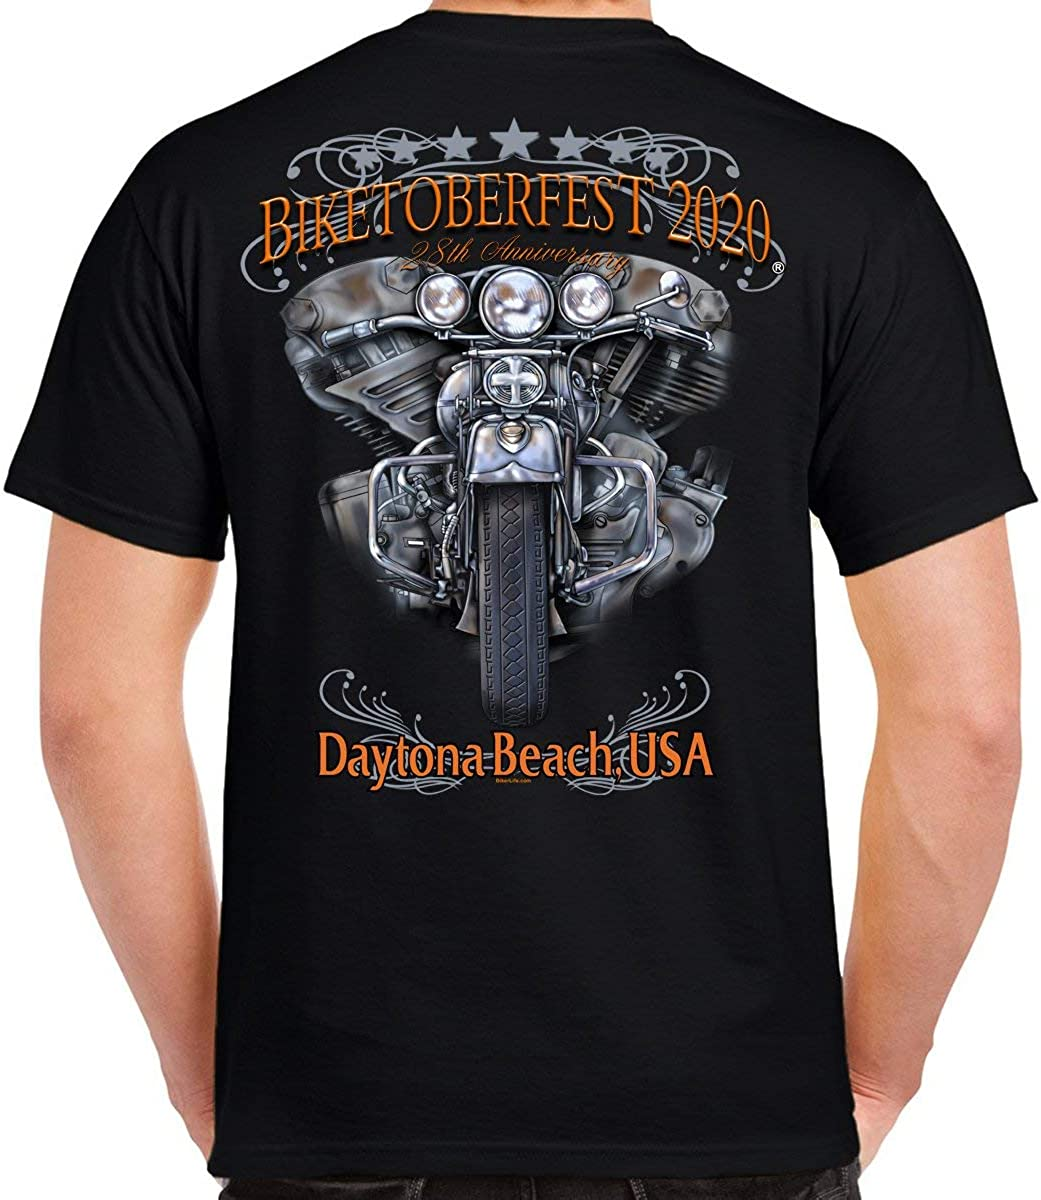 2020 Biketoberfest Daytona Beach Ride to Remember T-Shirt